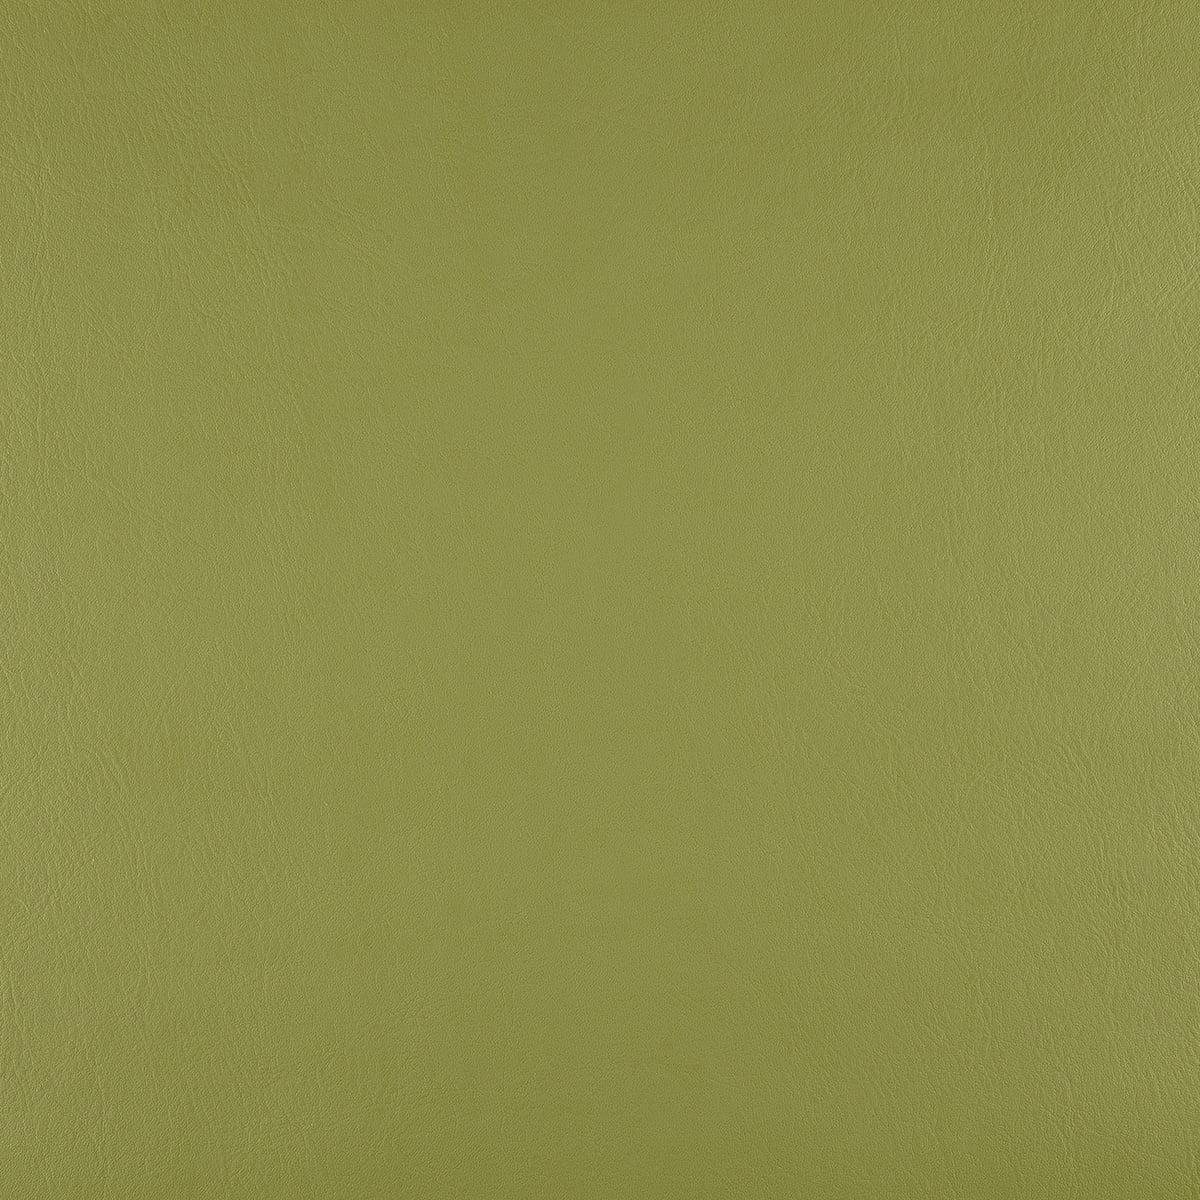 Wasabi  Chieftain Fabrics # Wasbak Fabriek_155207